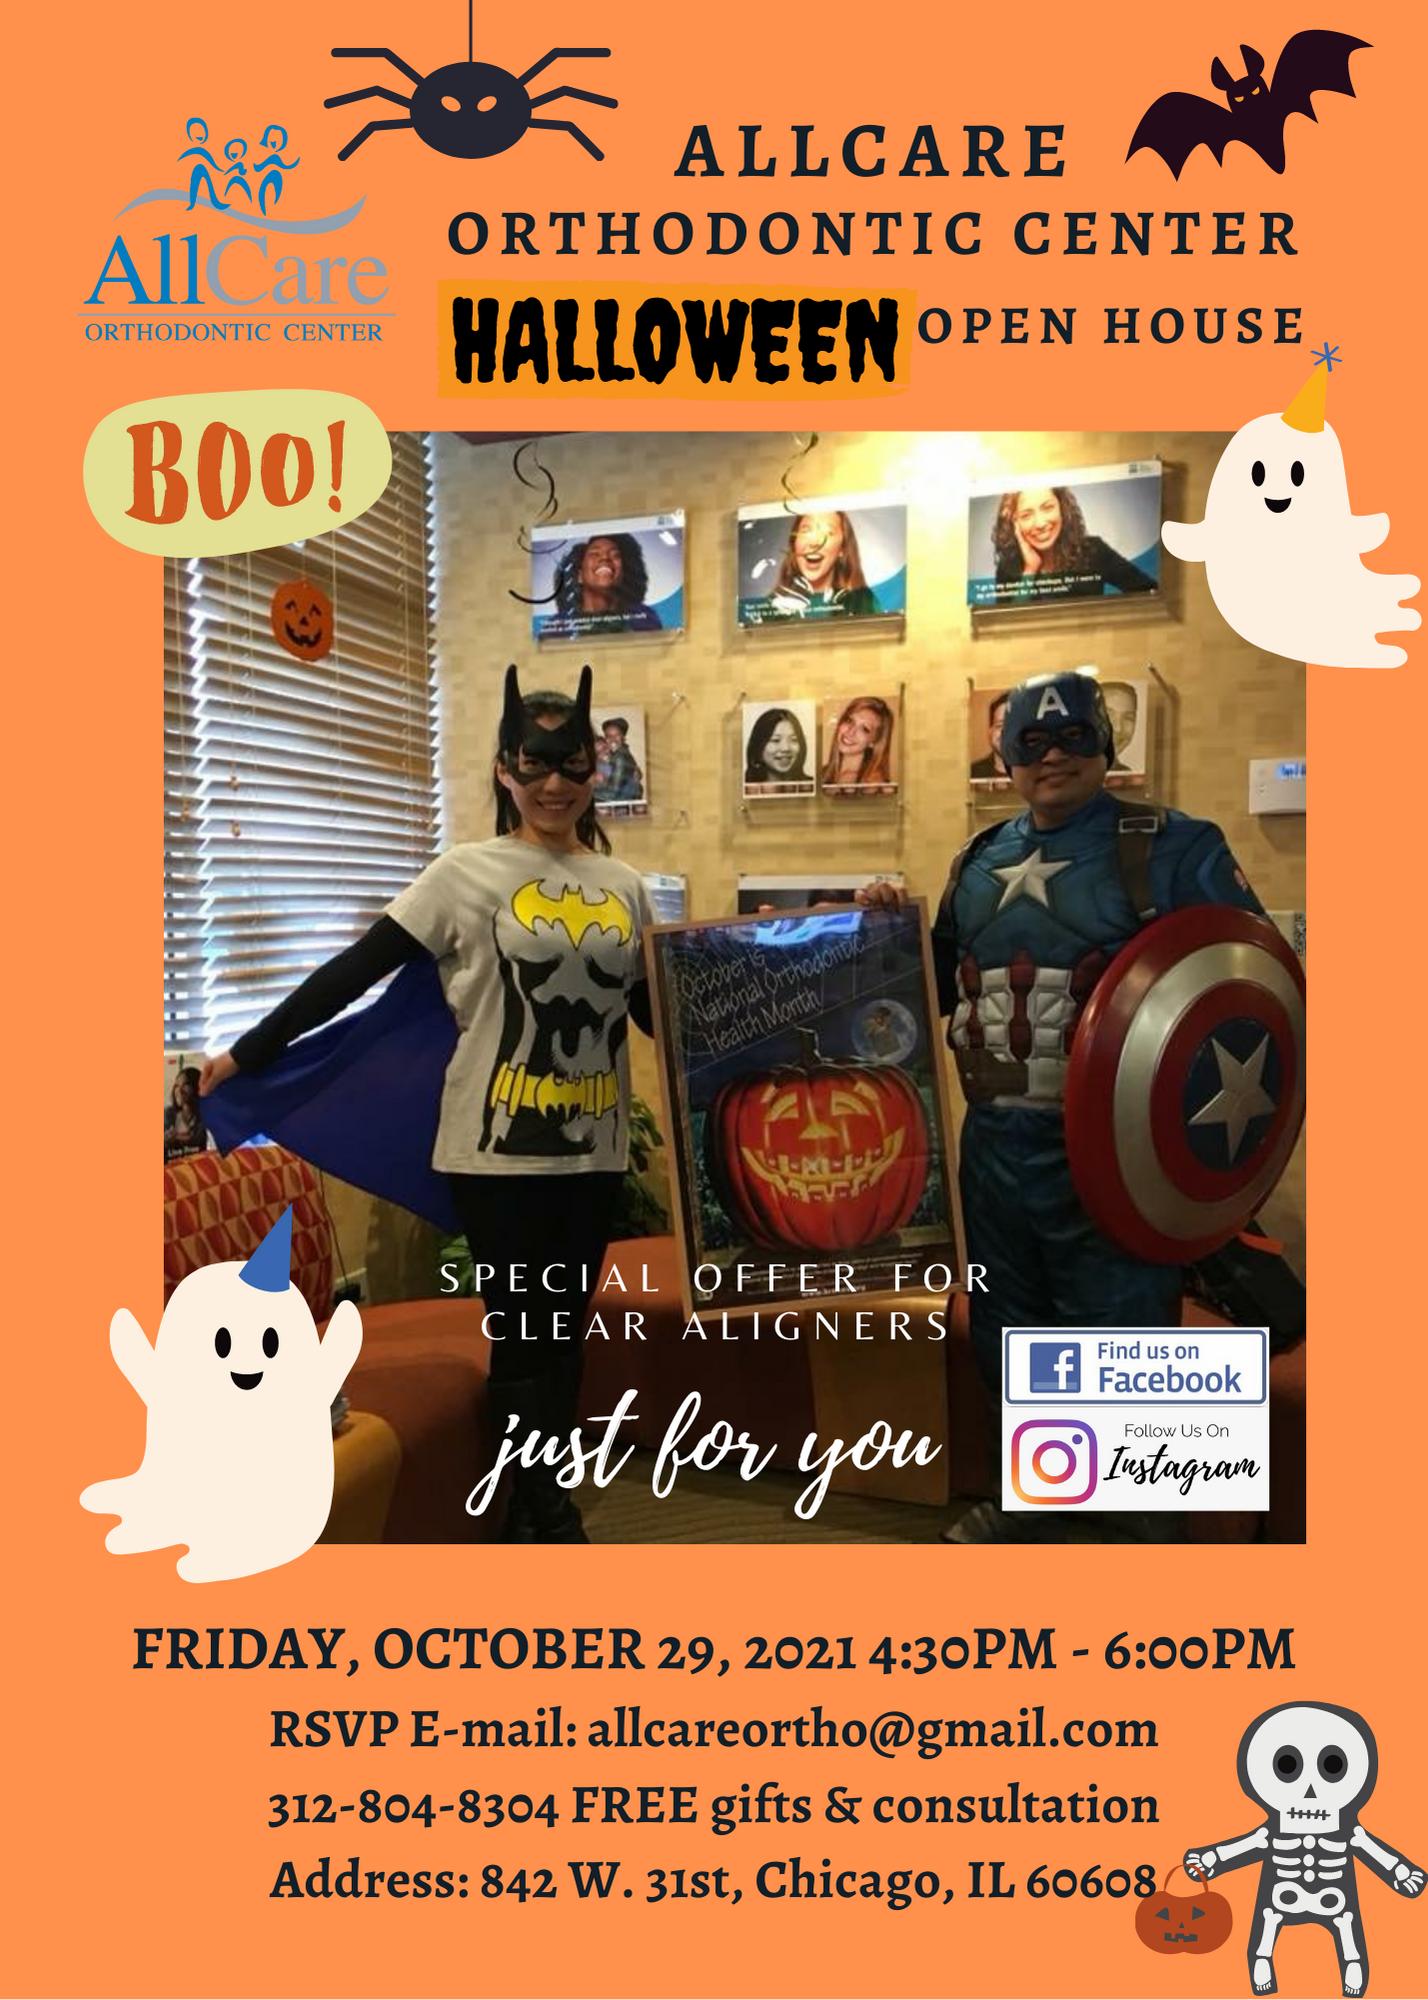 AllCare Halloween Open House Flyer 2021